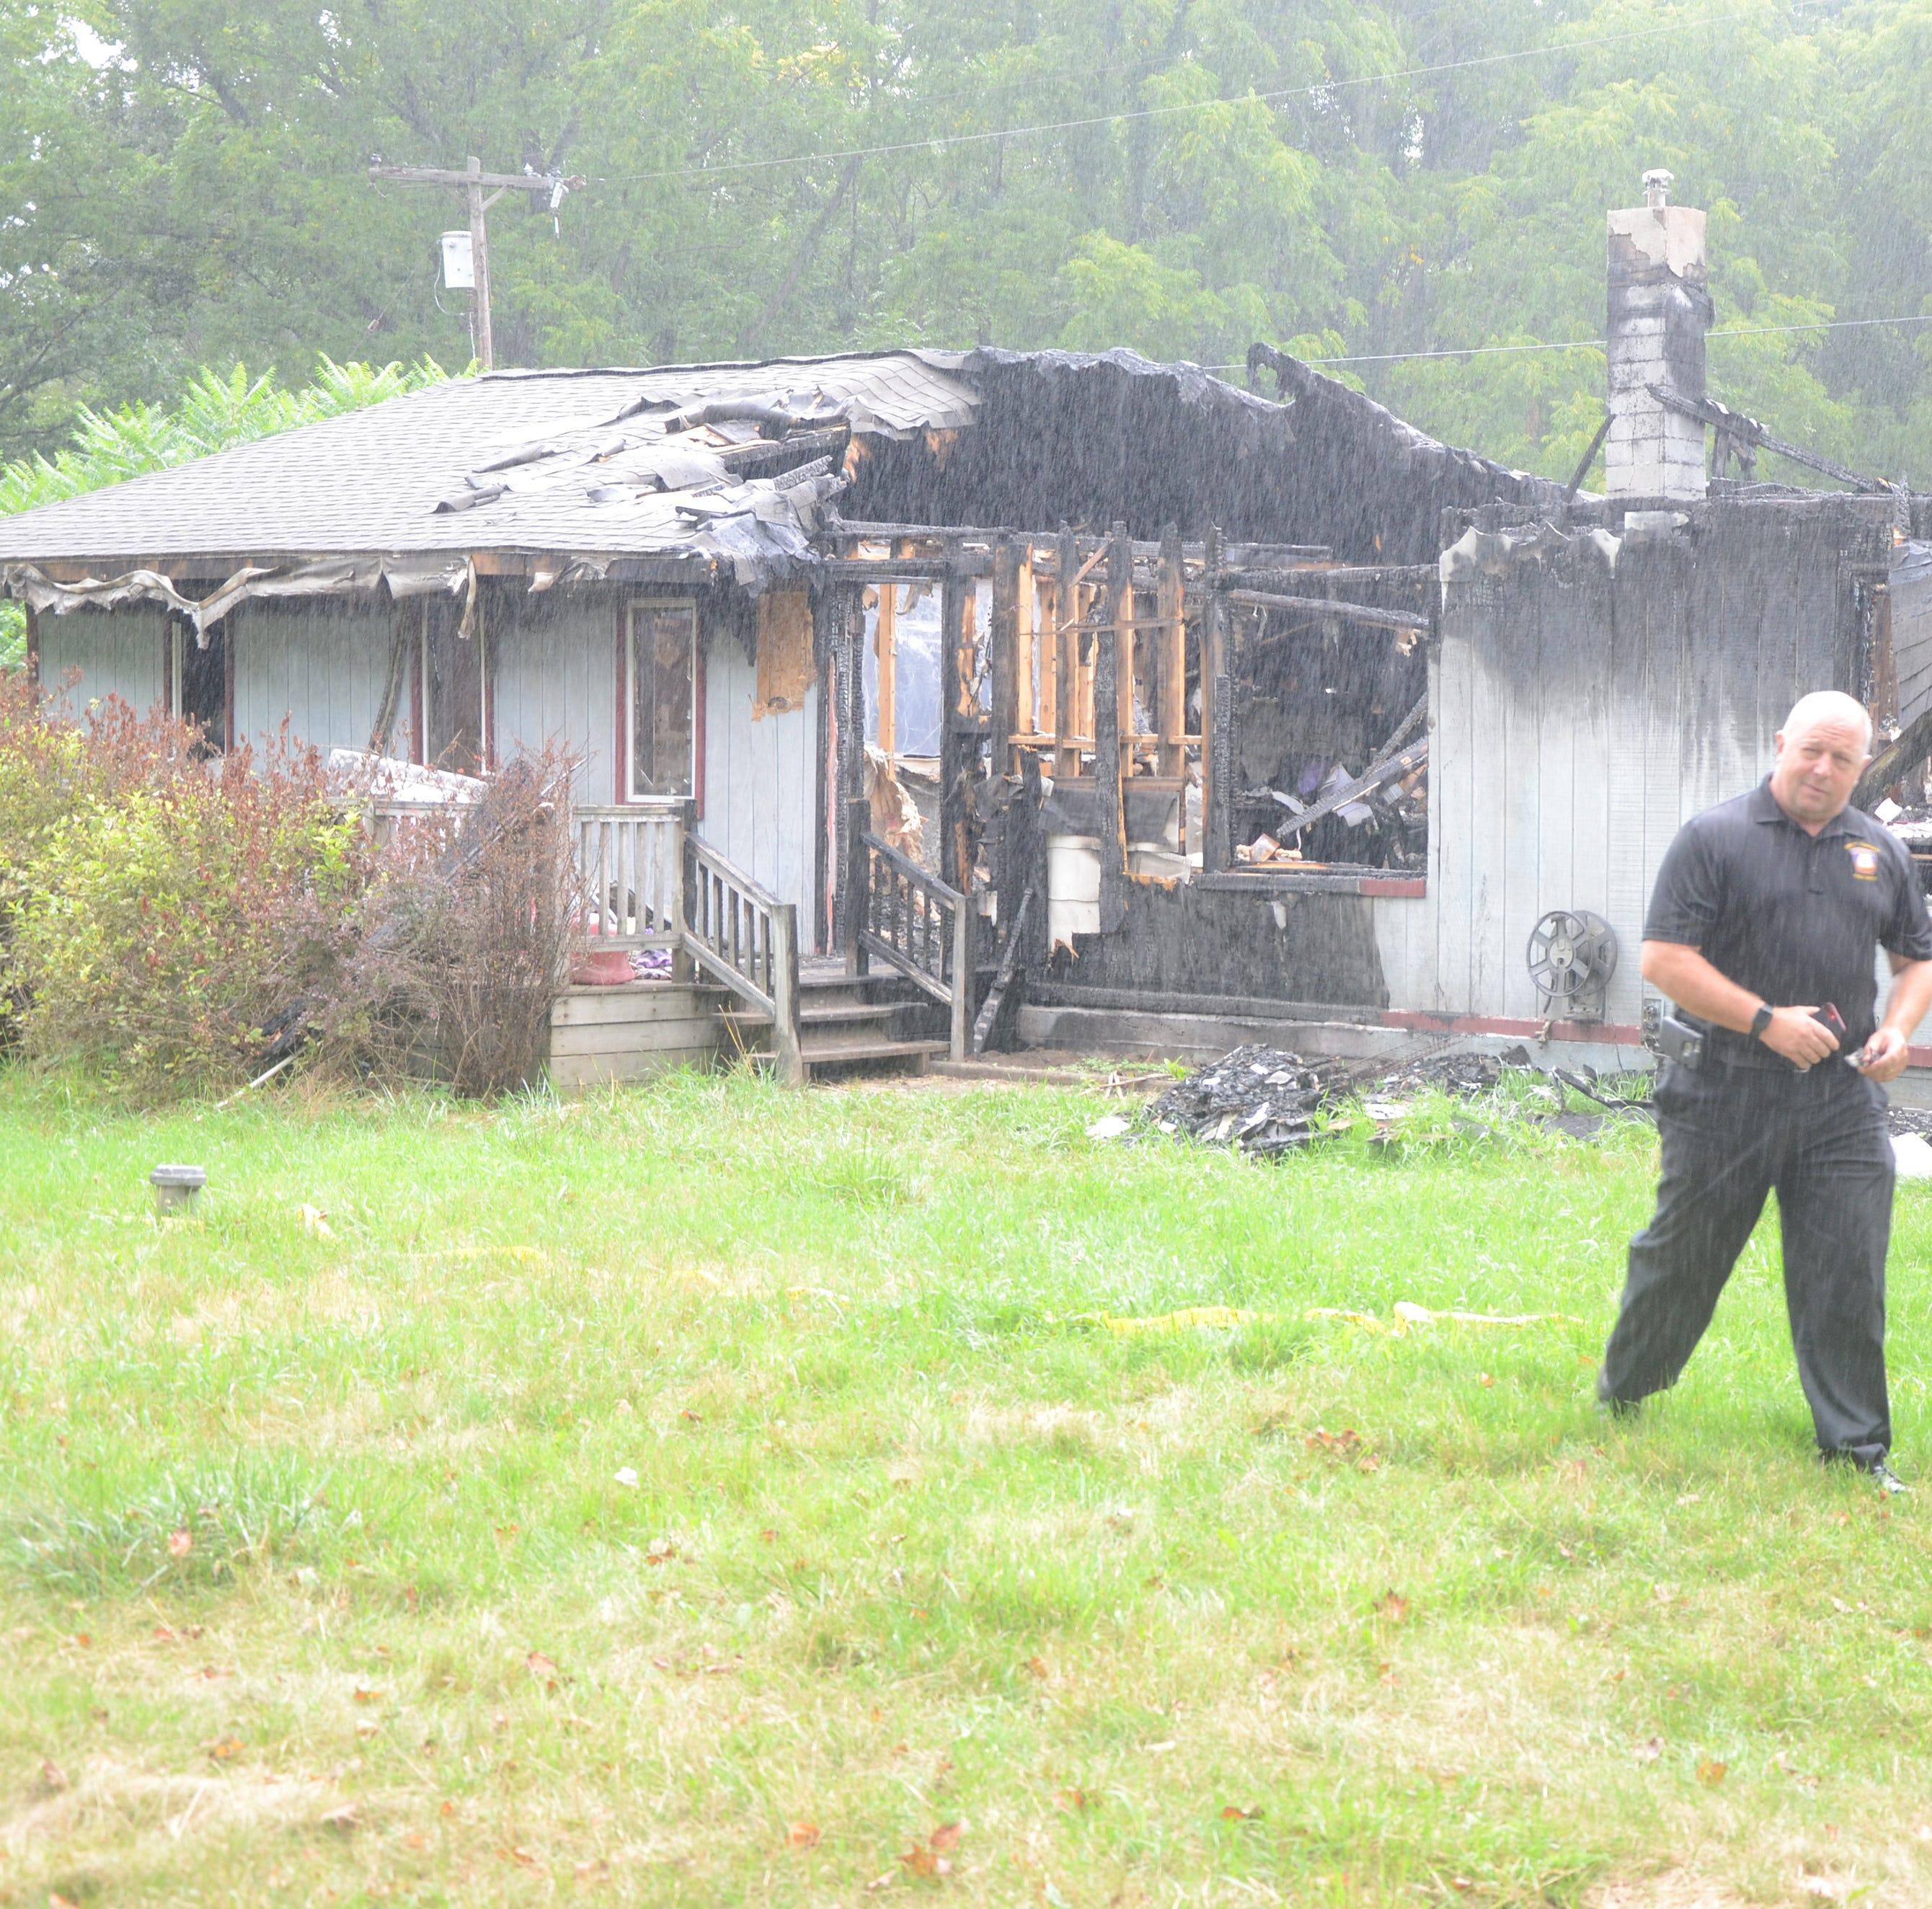 Police & Fire: Investigators seeking information on suspicious fire